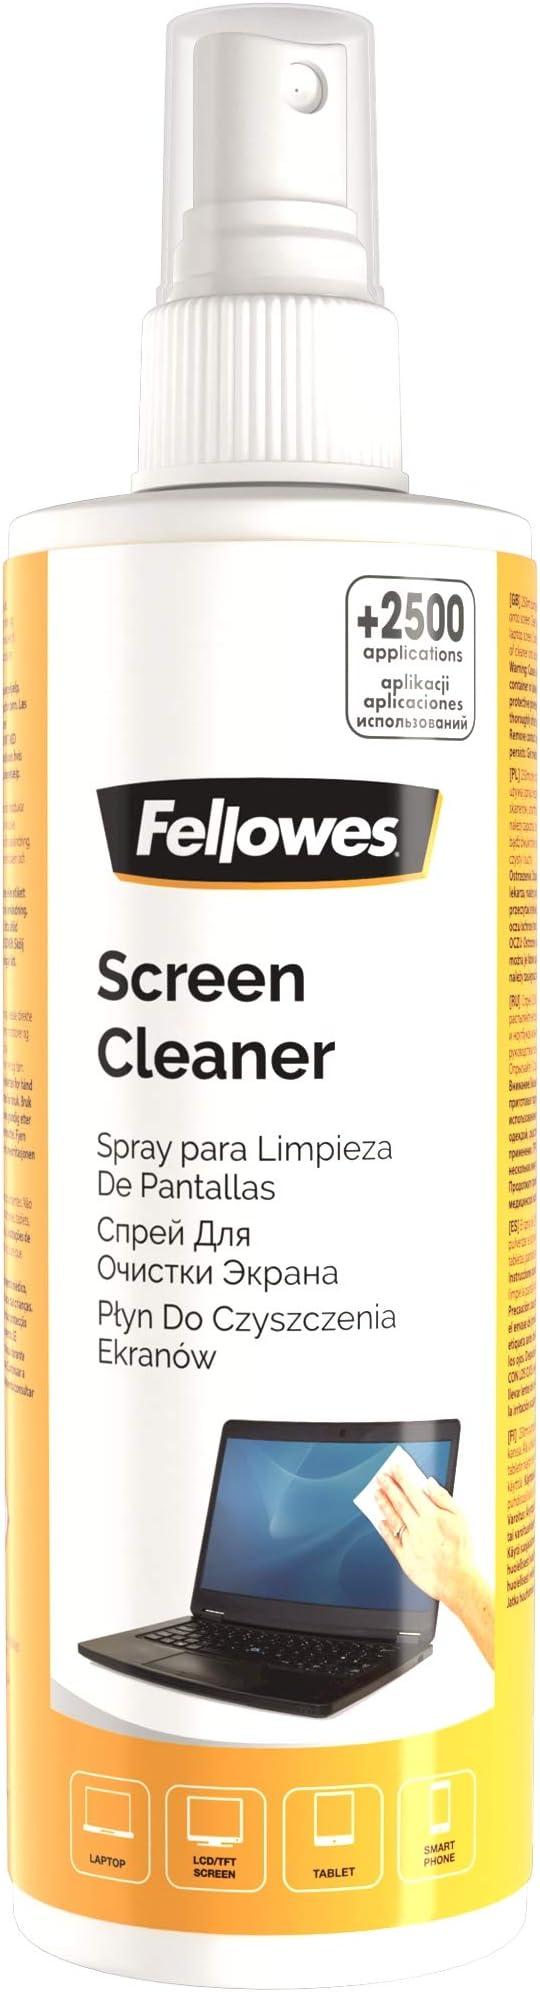 Kit de limpieza para ordenador Fellowes 9971806